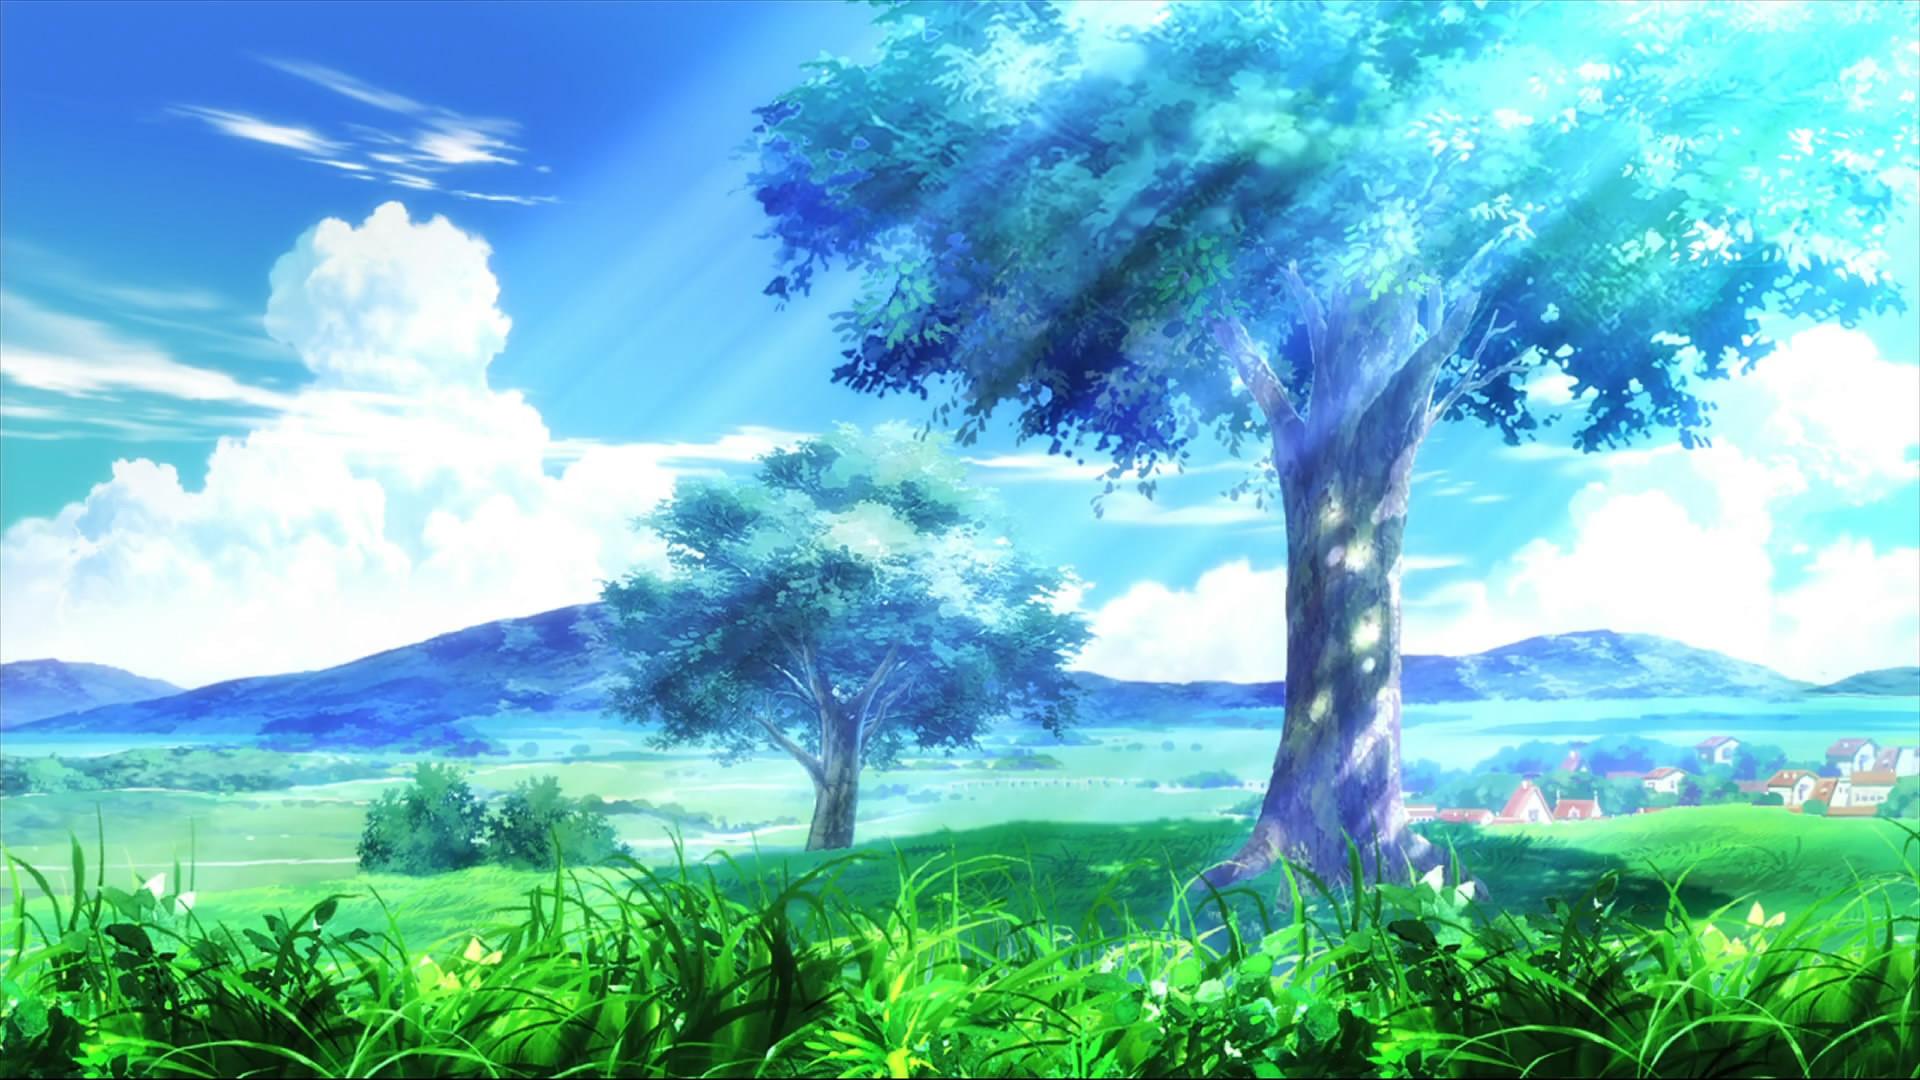 Anime Scenery Desktop Background | Wallmeta.com